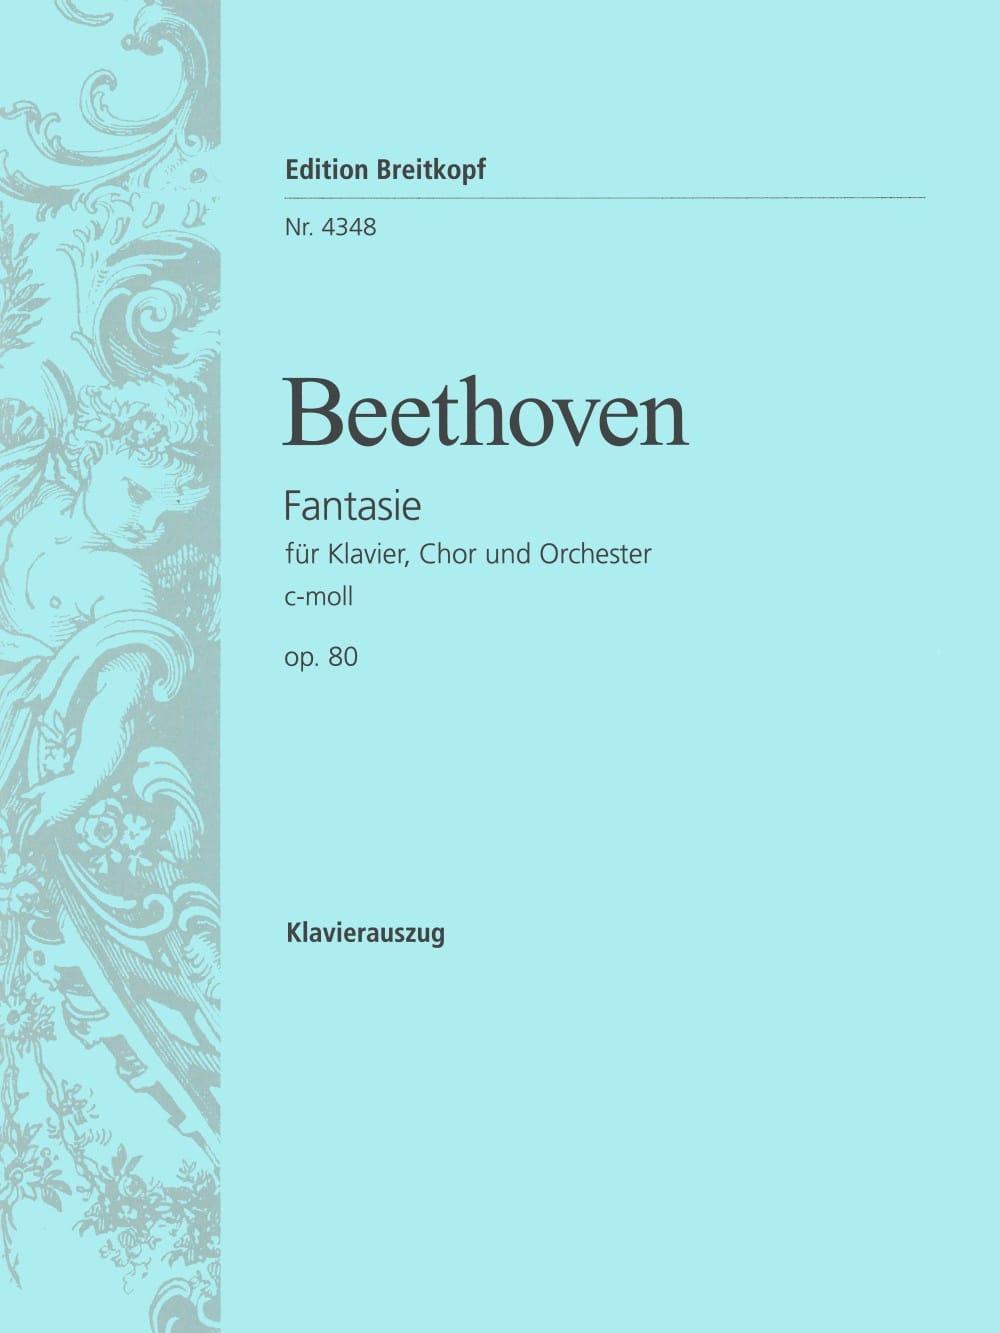 Chorfantasie C-Moll Opus 80 - BEETHOVEN - Partition - laflutedepan.com